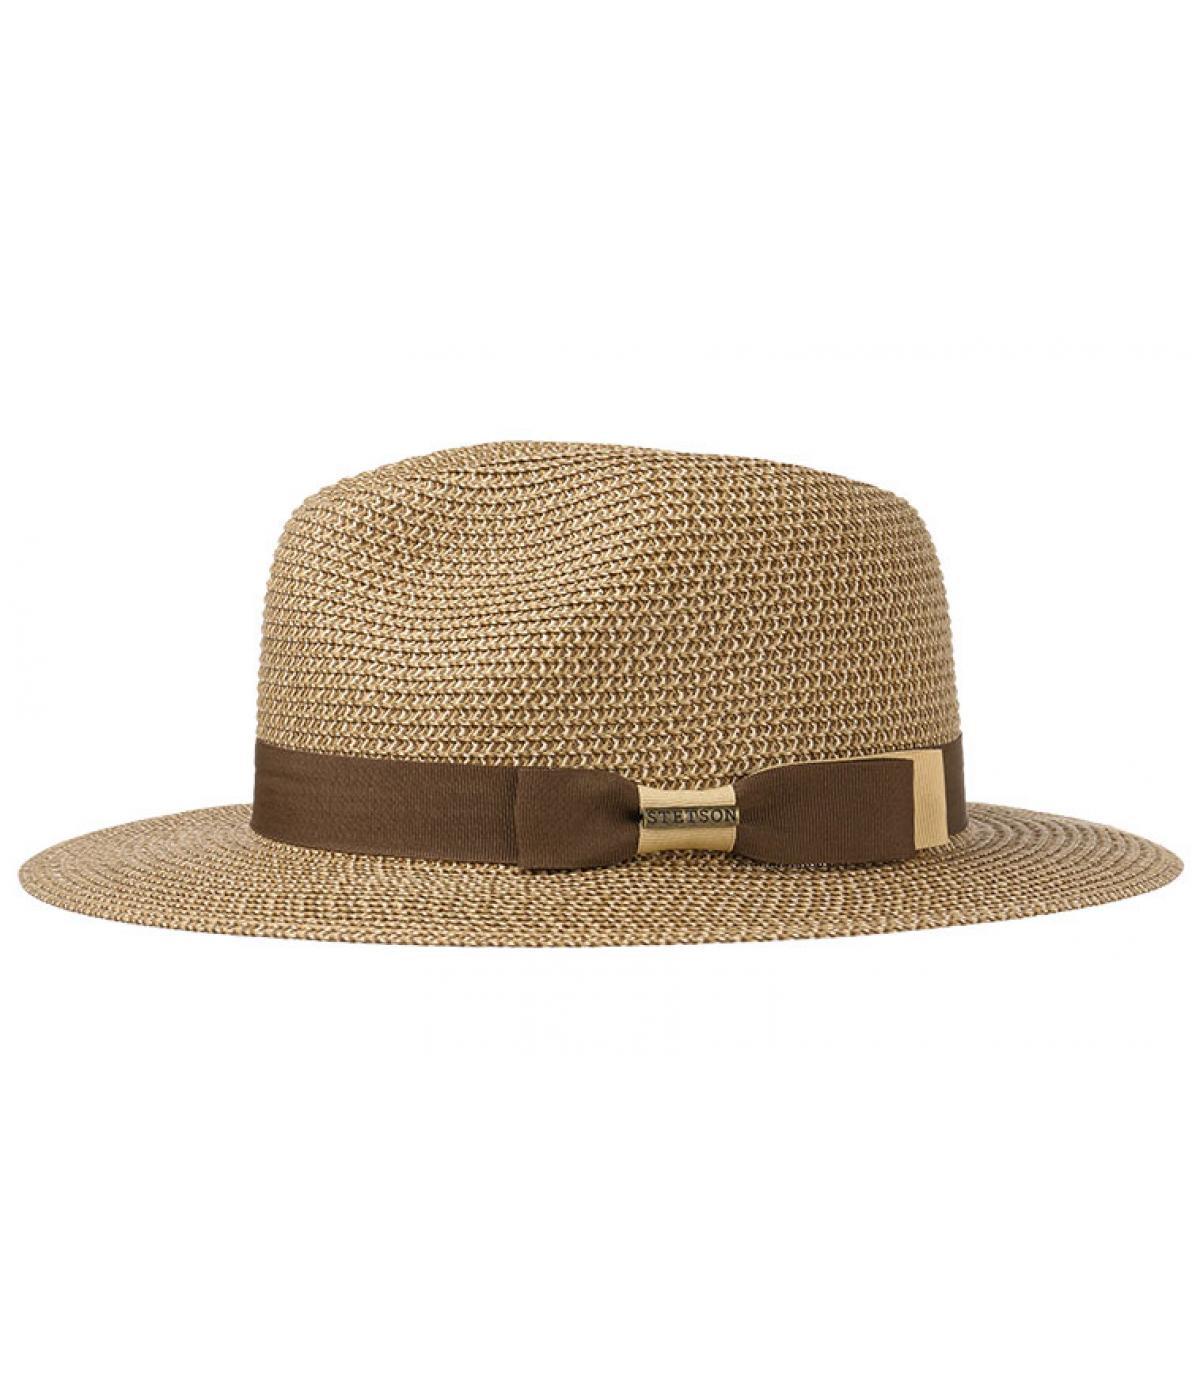 sombrero de paja rayas borde ancho